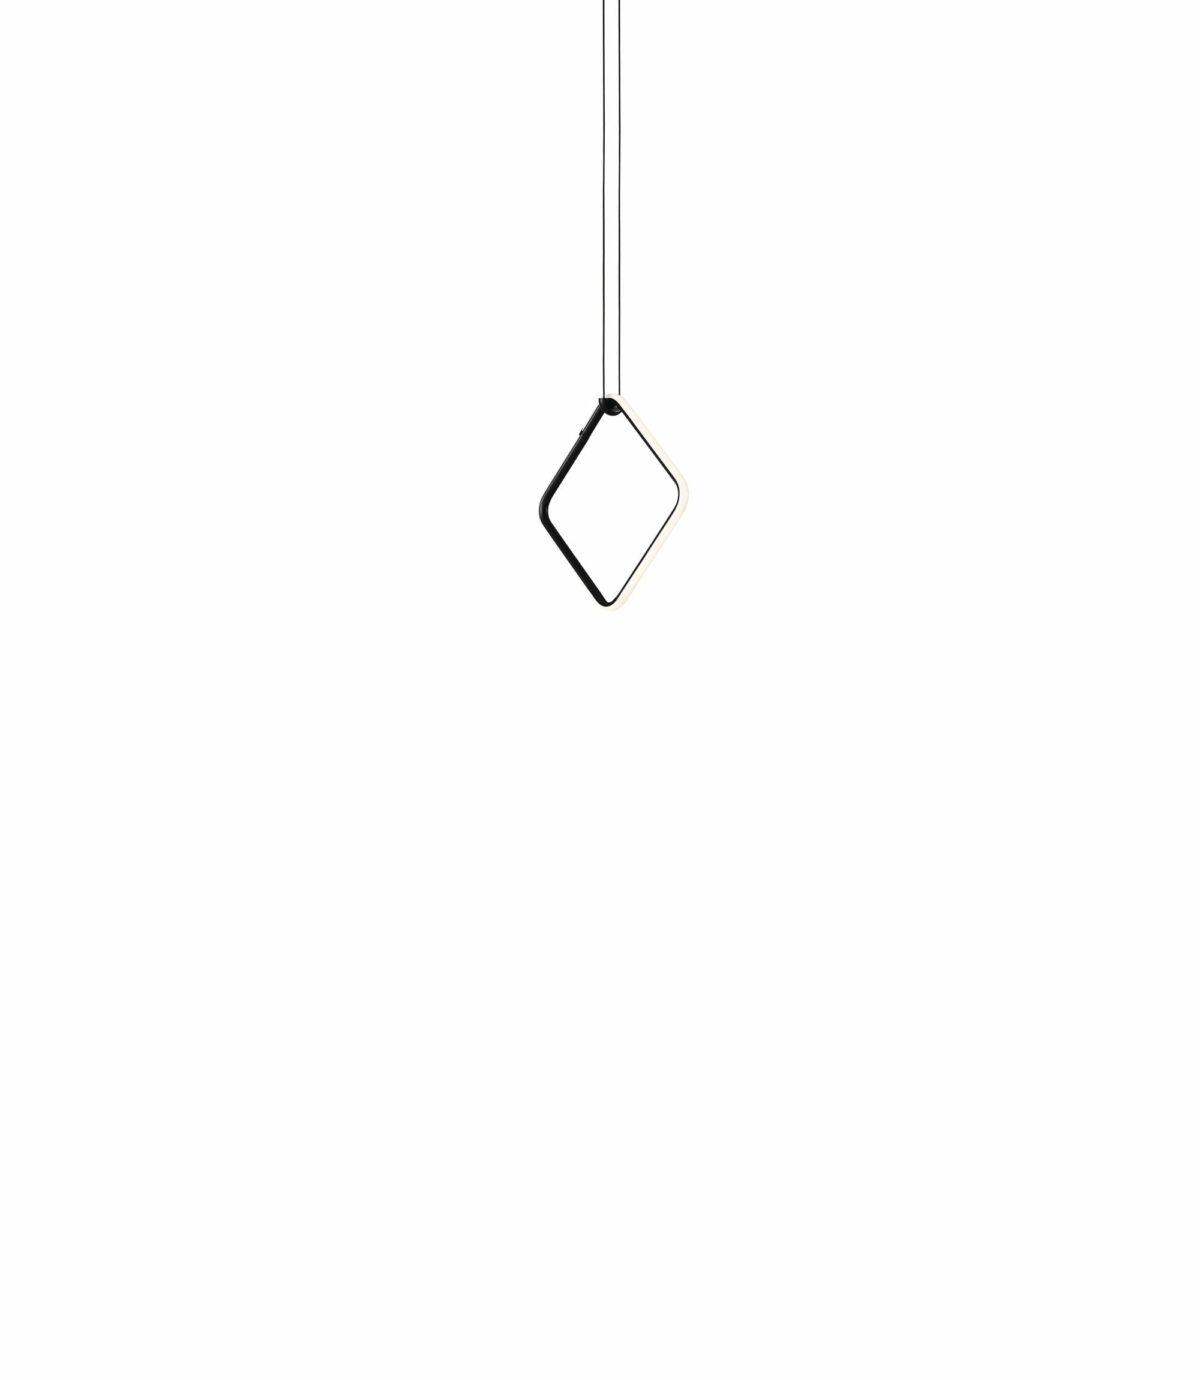 Arrangements suspension square small anastassiades flos F0410030 product still life big 1